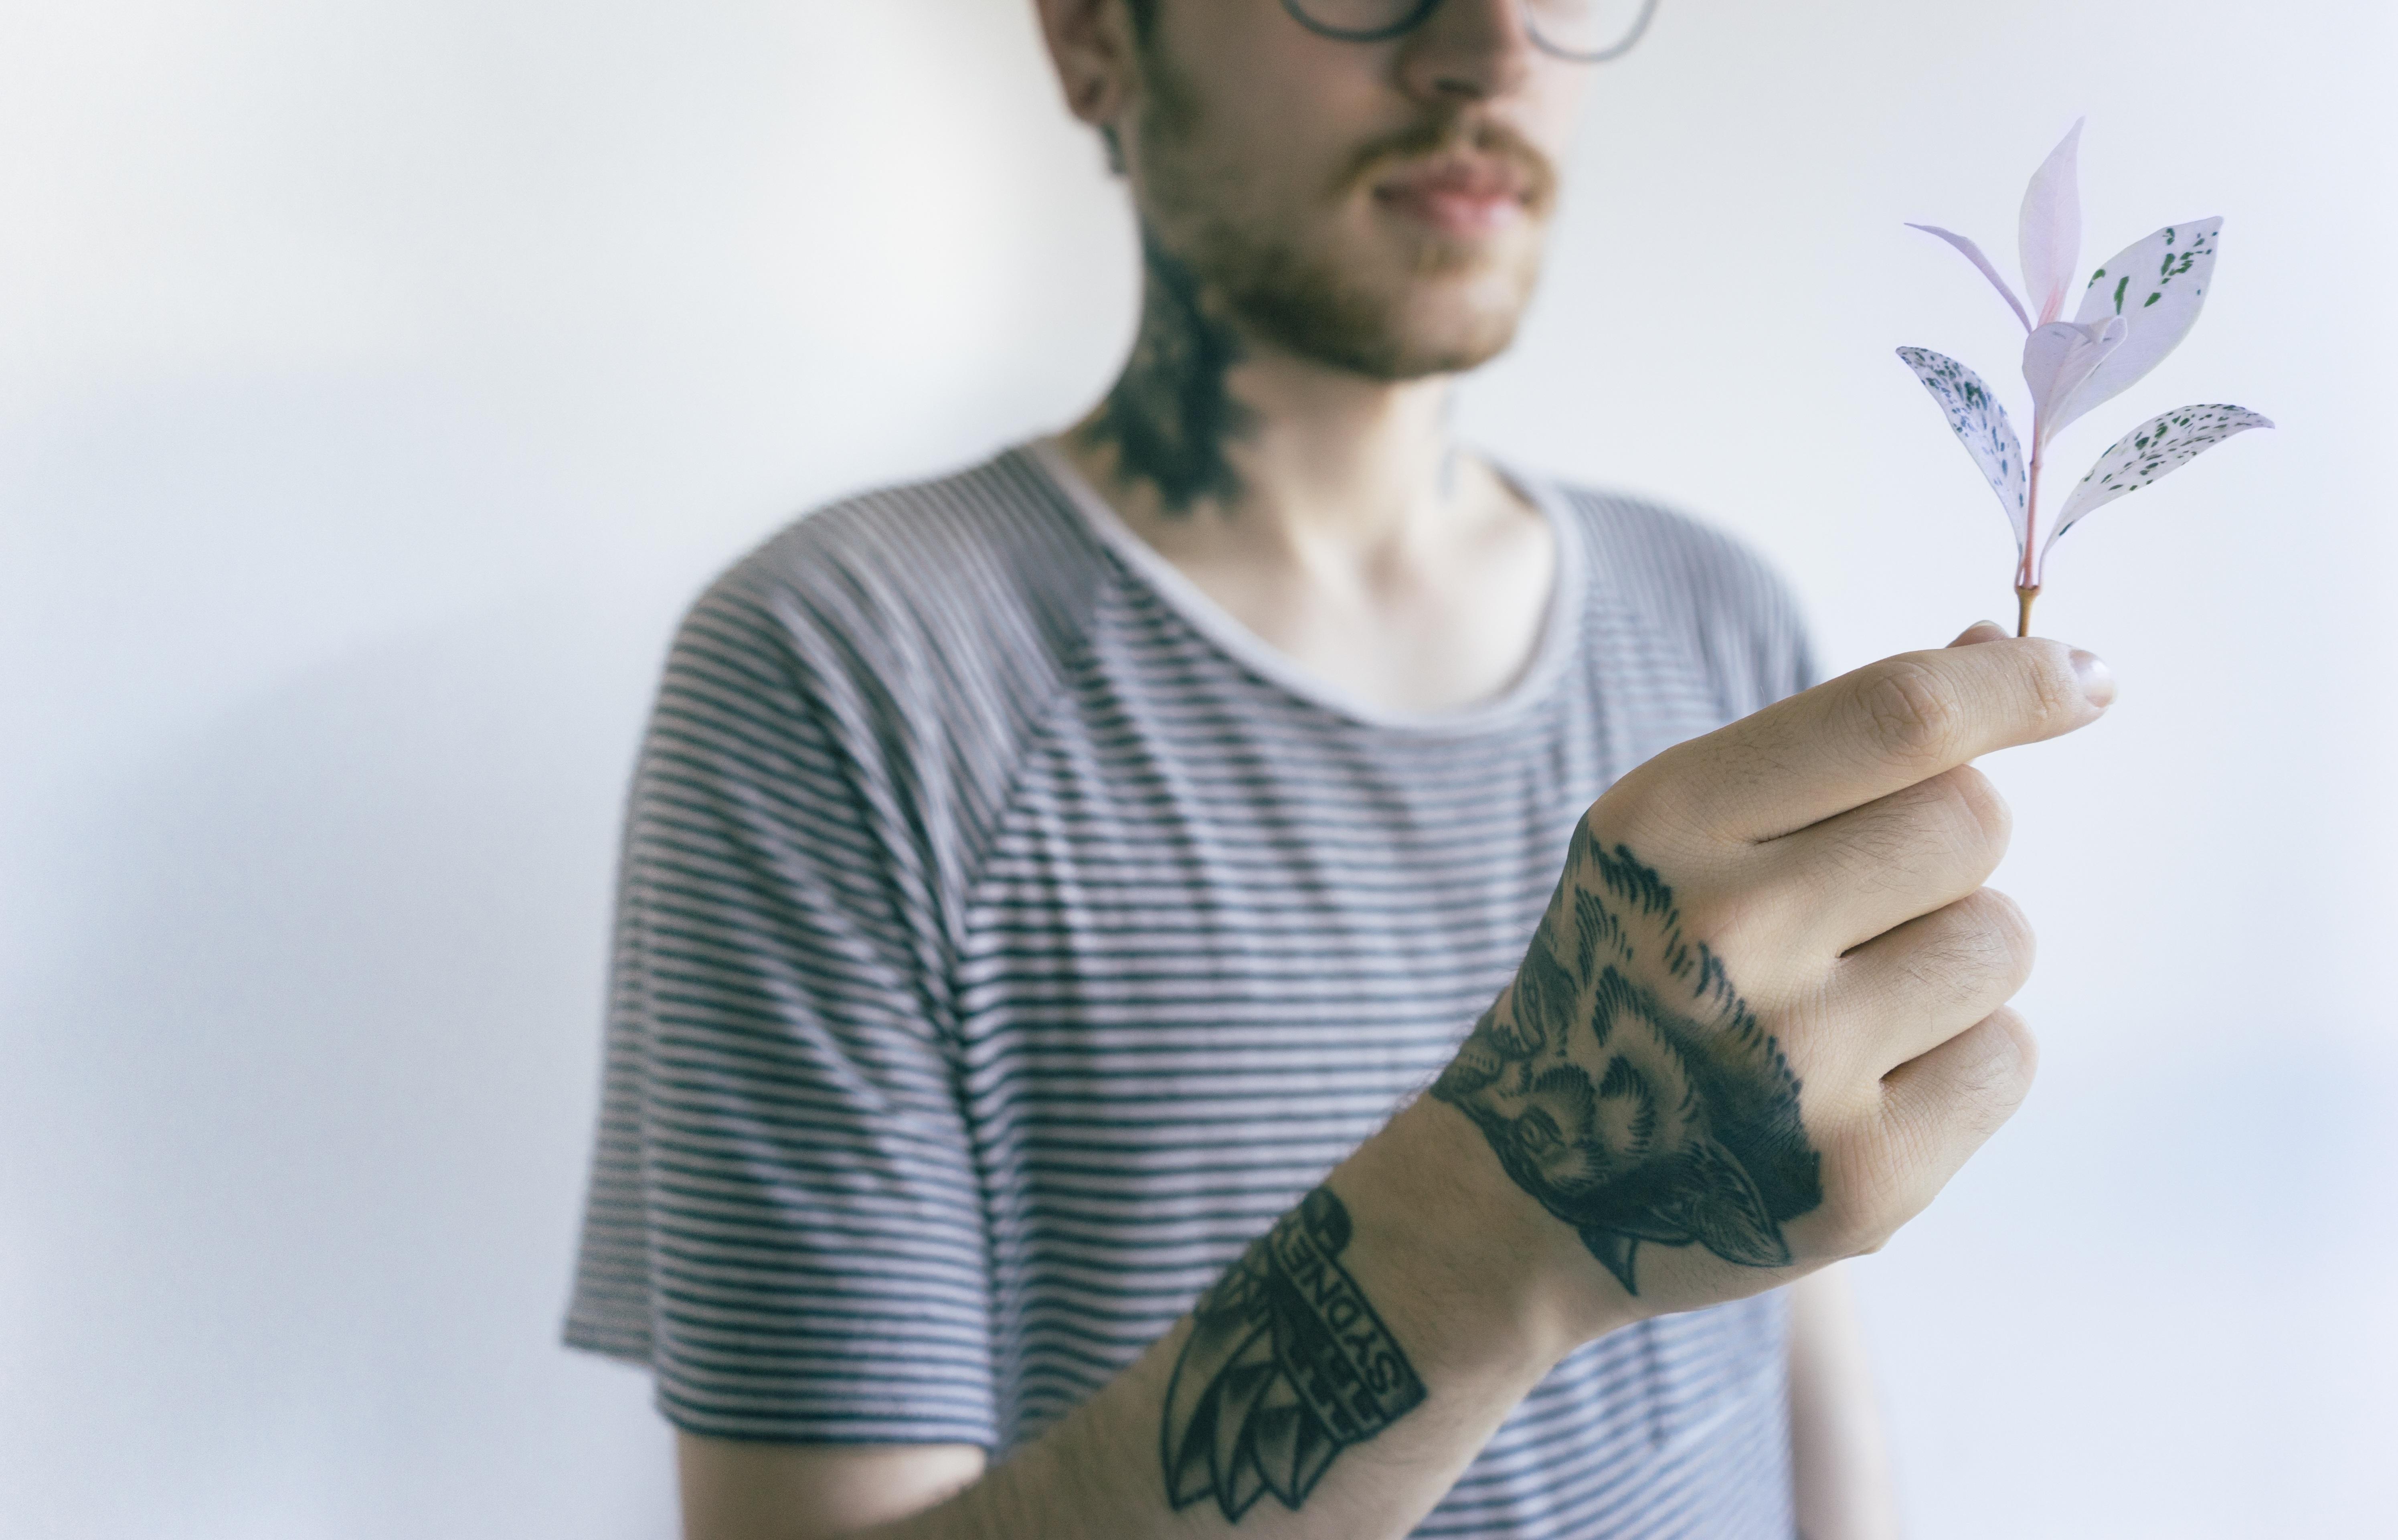 Gambar Tangan Manusia Jari Musim Semi Lengan Memegang Desain Kacamata Tato Sederhana Memilih Contoh 5981x3841 631668 Galeri Foto Pxhere